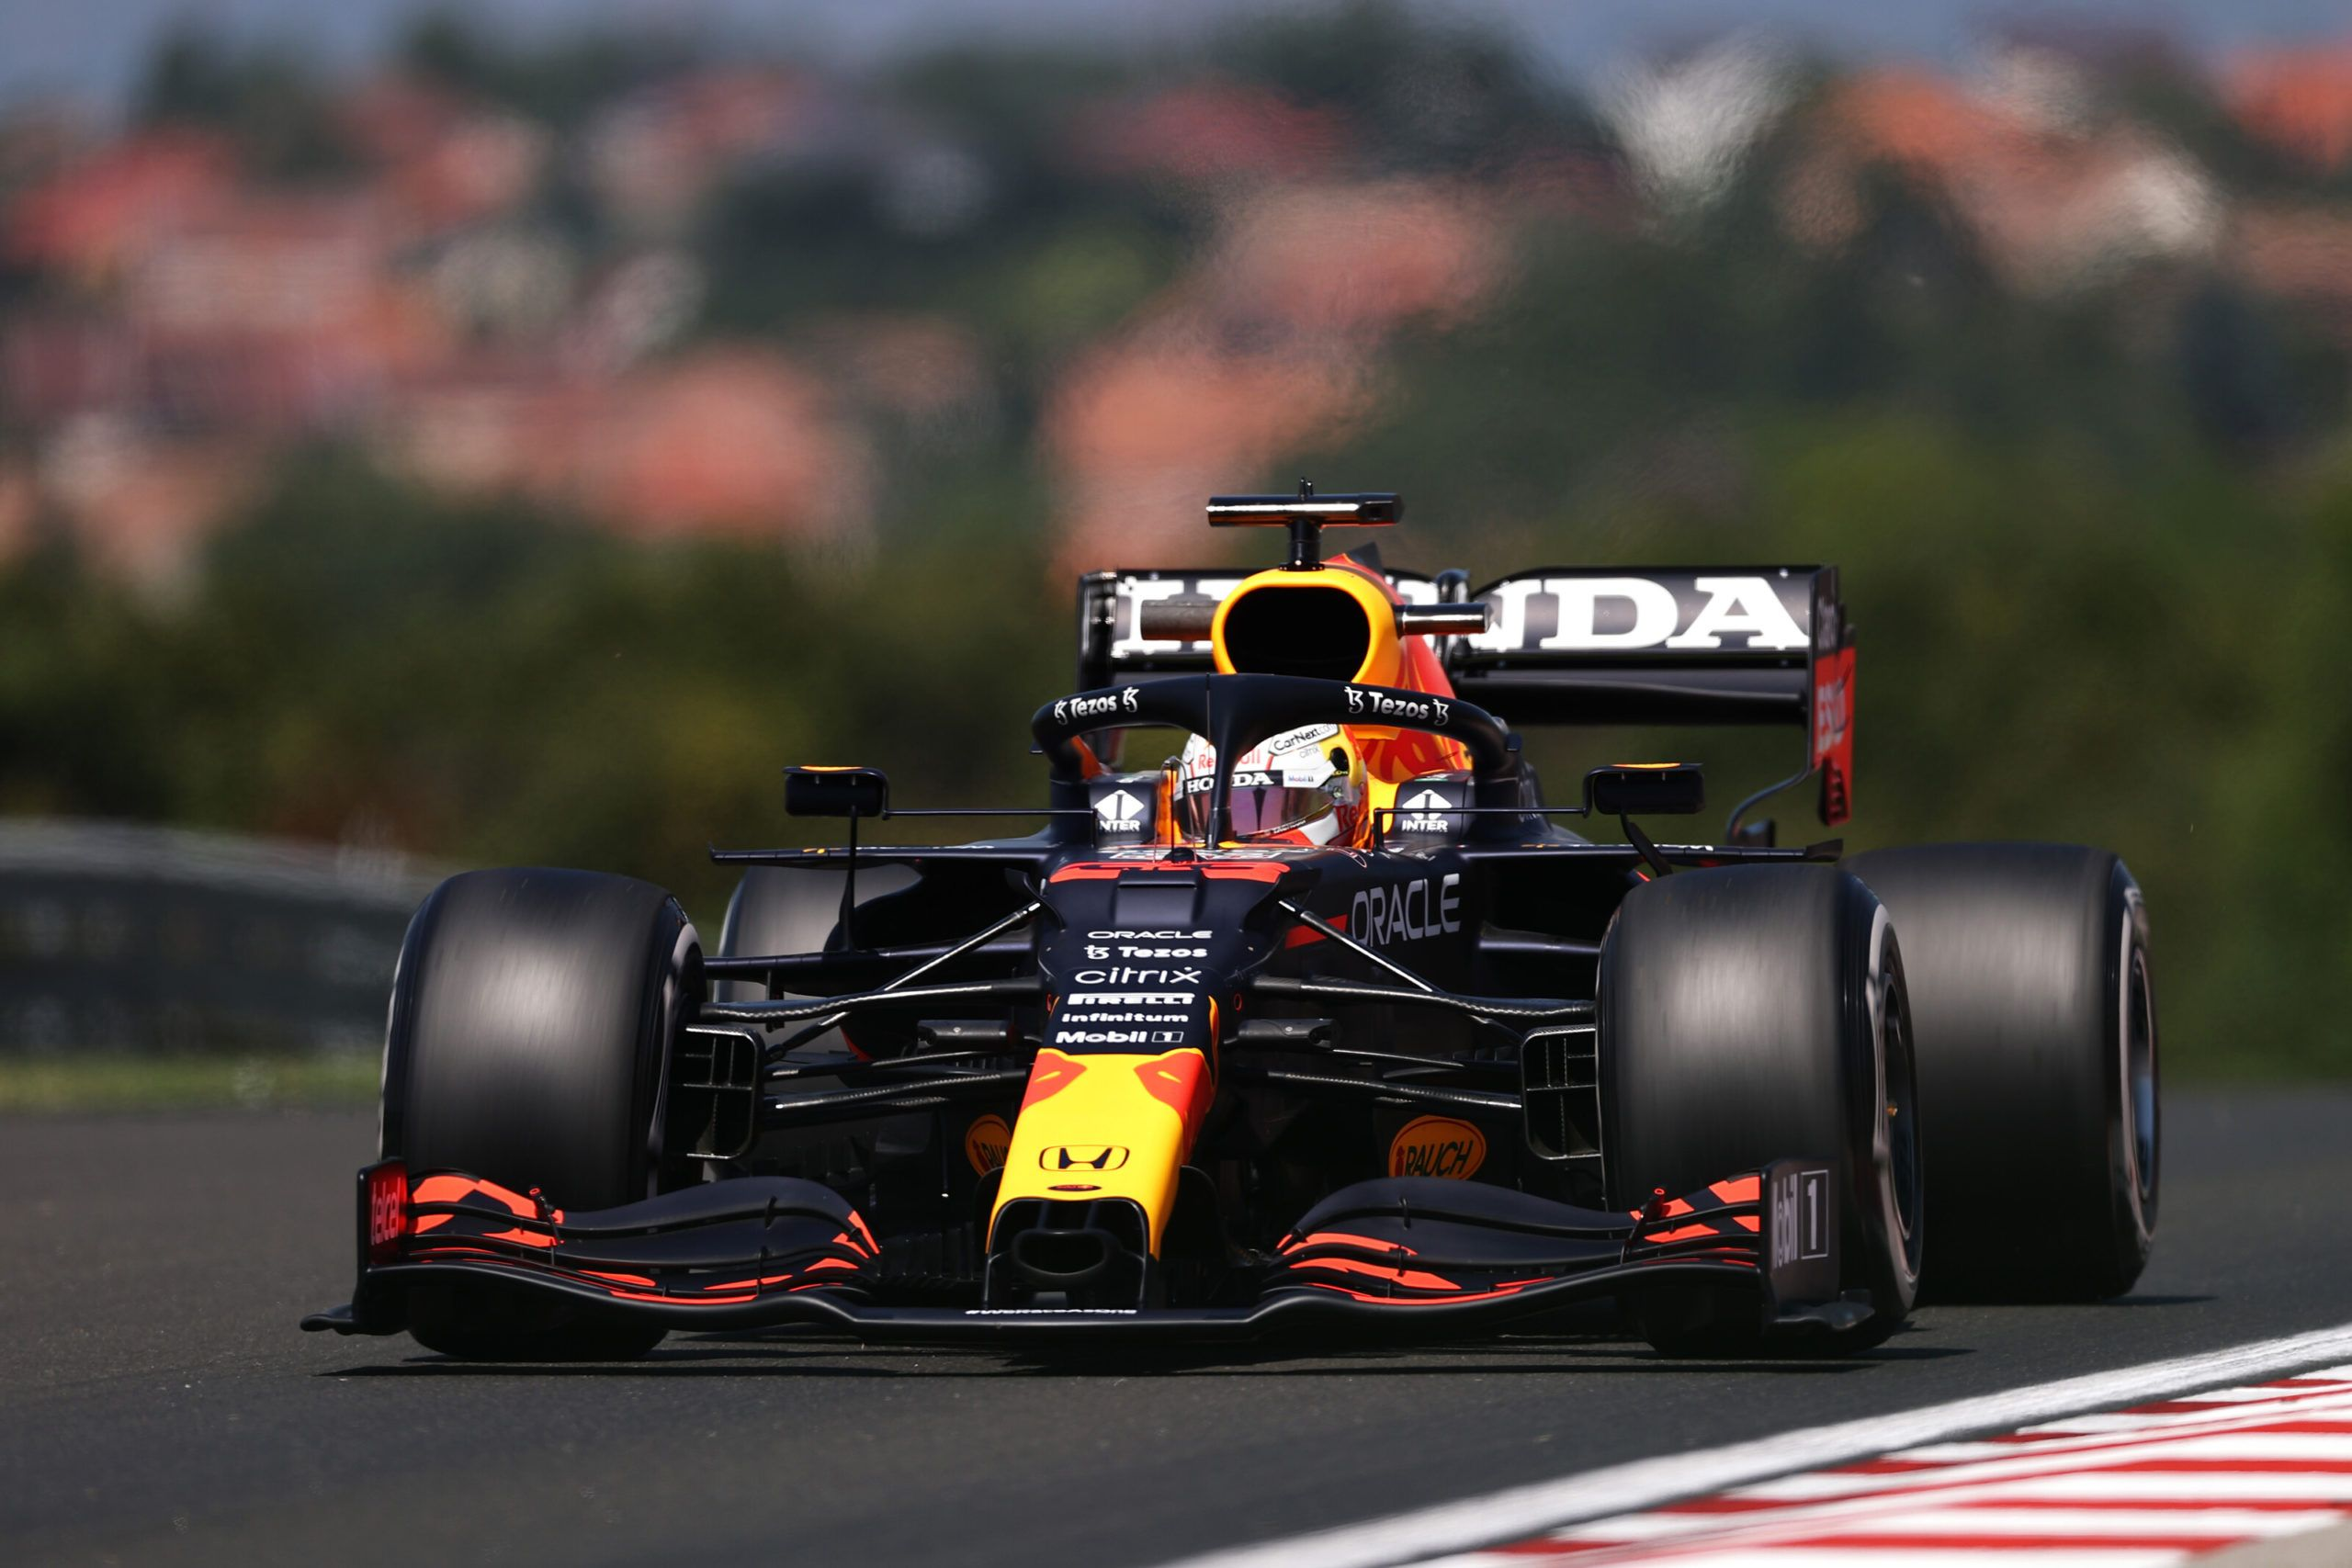 F1, Hungarian GP, Max Verstappen